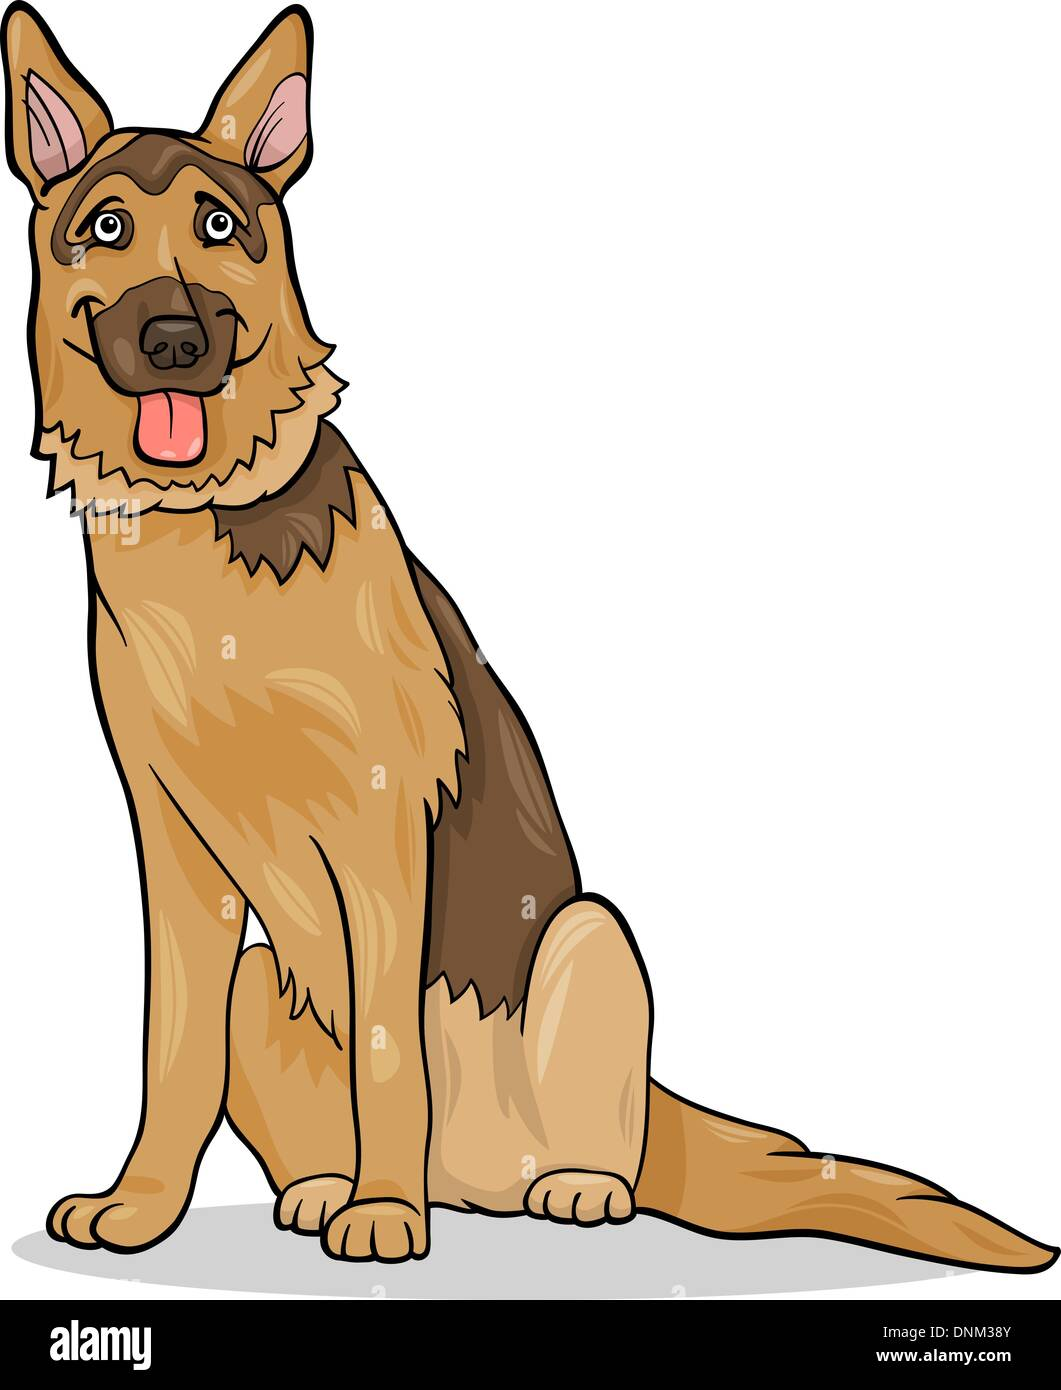 Cartoon Illustration of Funny German Shepherd Purebred Dog - Stock Vector